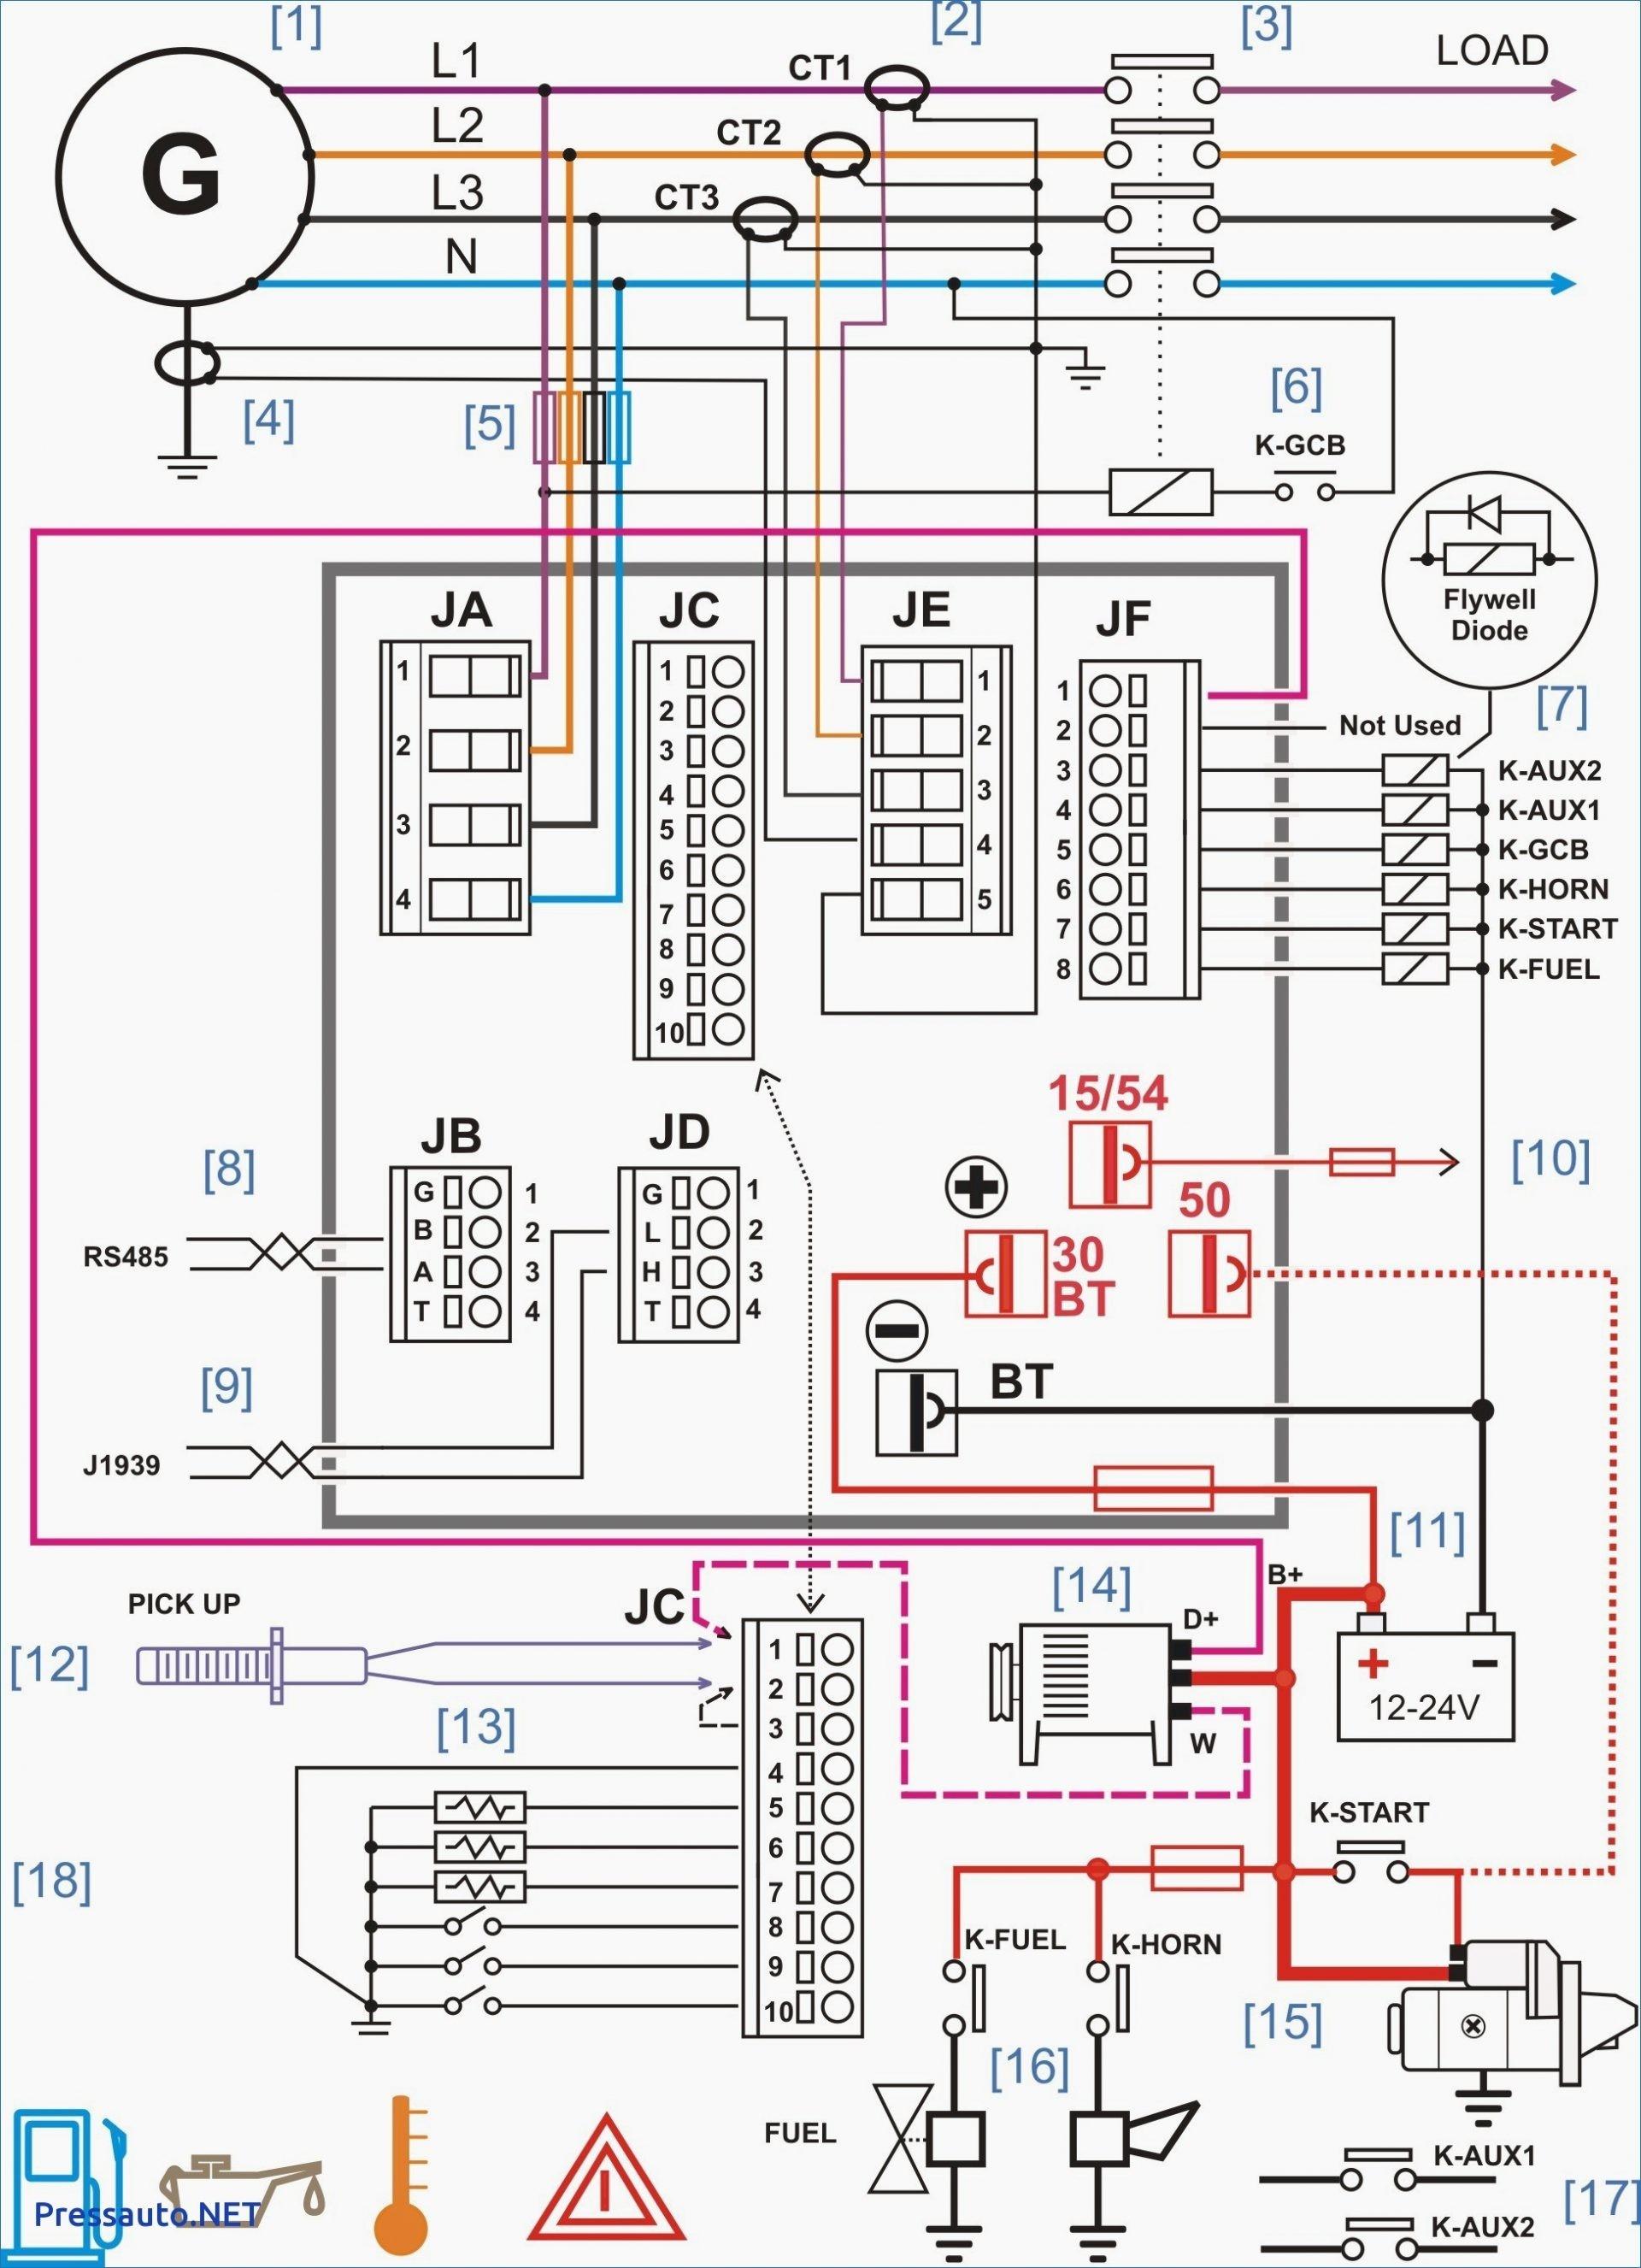 Onan P220 Engine Parts Diagram Starter for John Deere Onan ... A John Deere Wiring Diagram For Model on